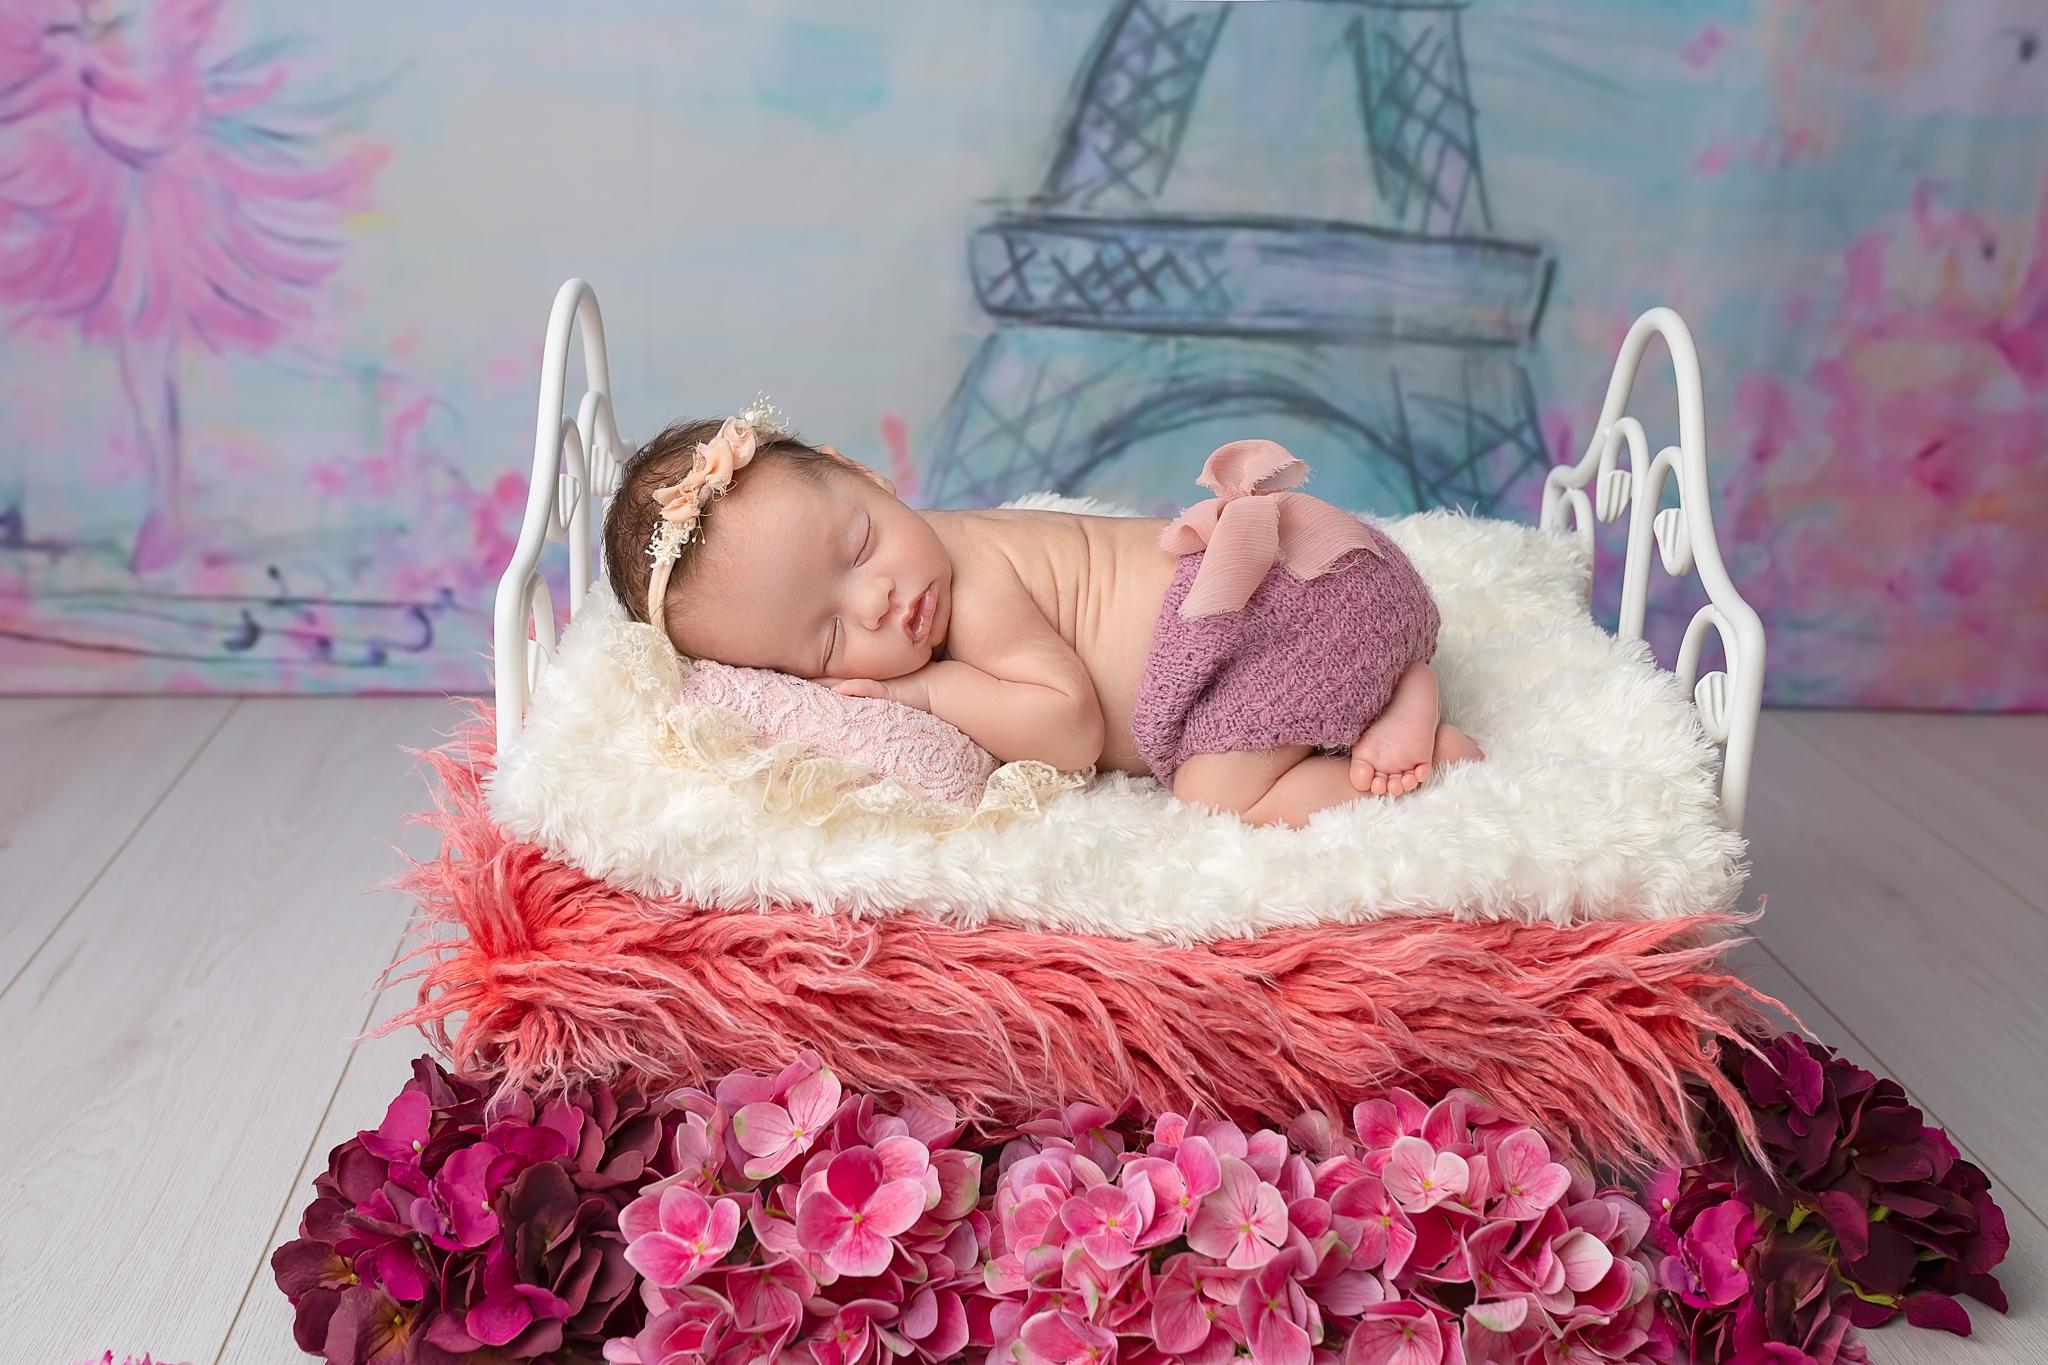 Professional newborn photography Leeds-York-Bradford-Harrogate-Wakefield: newborn baby girl sleeping in a cute little bed during her newborn photoshoot in Leeds, Yorkshire